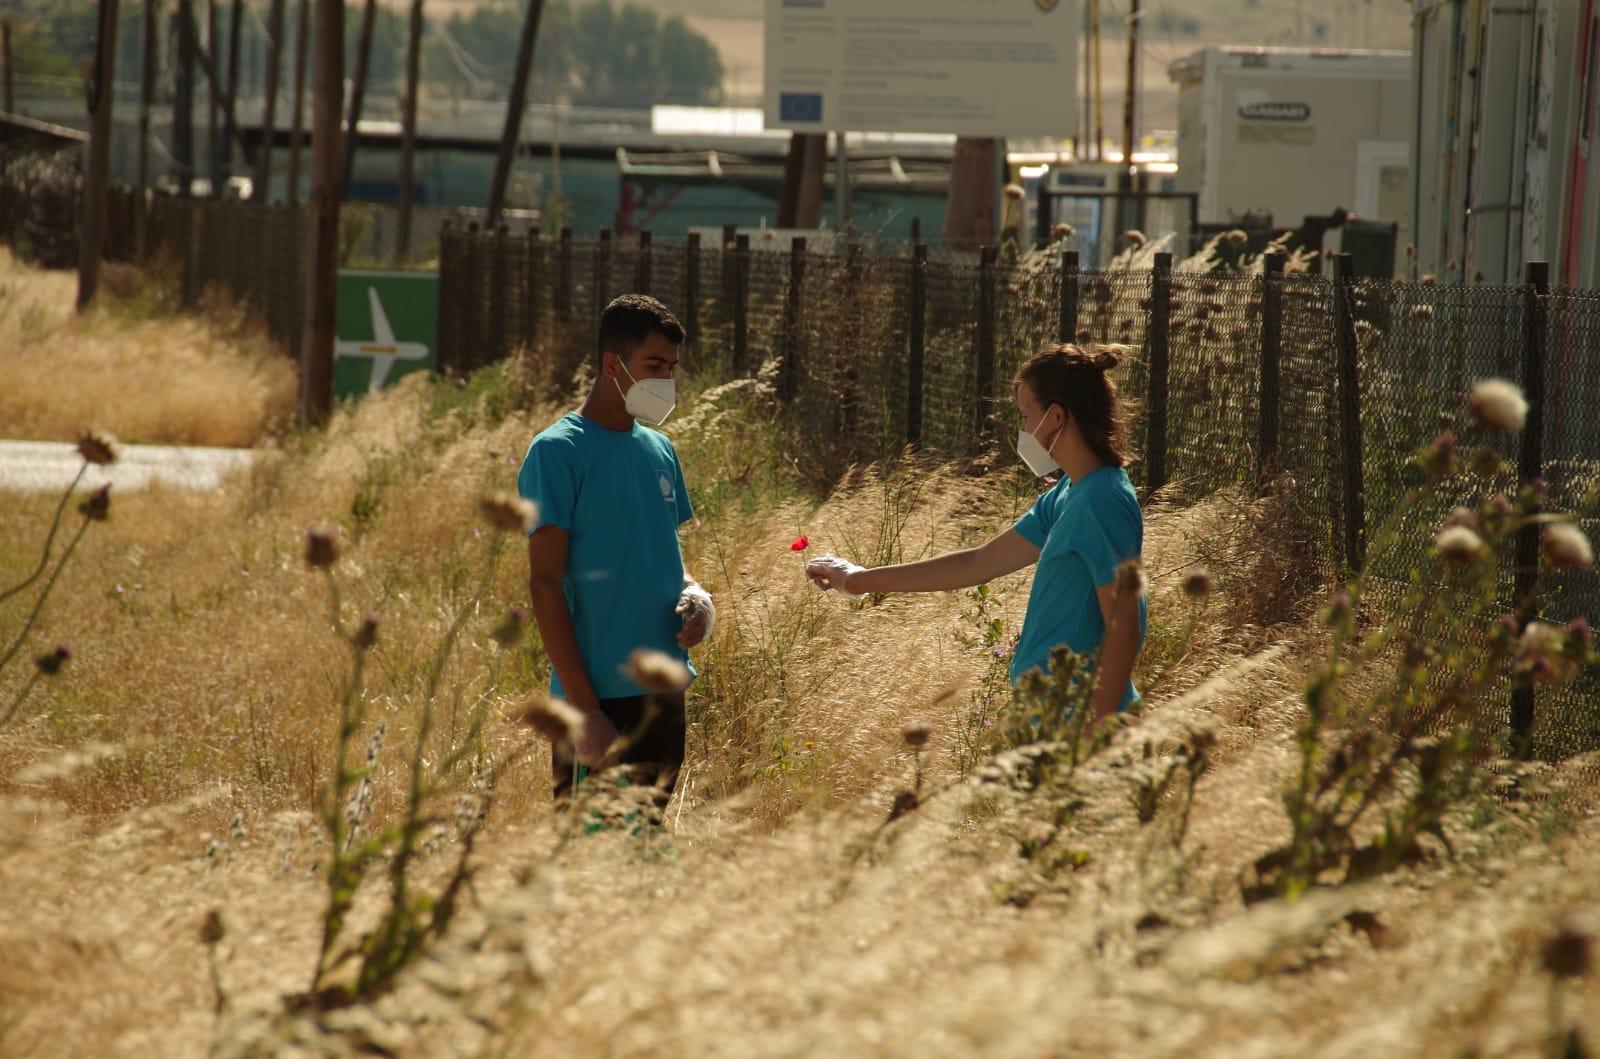 Nea Kavala flyktningleir refugee camp